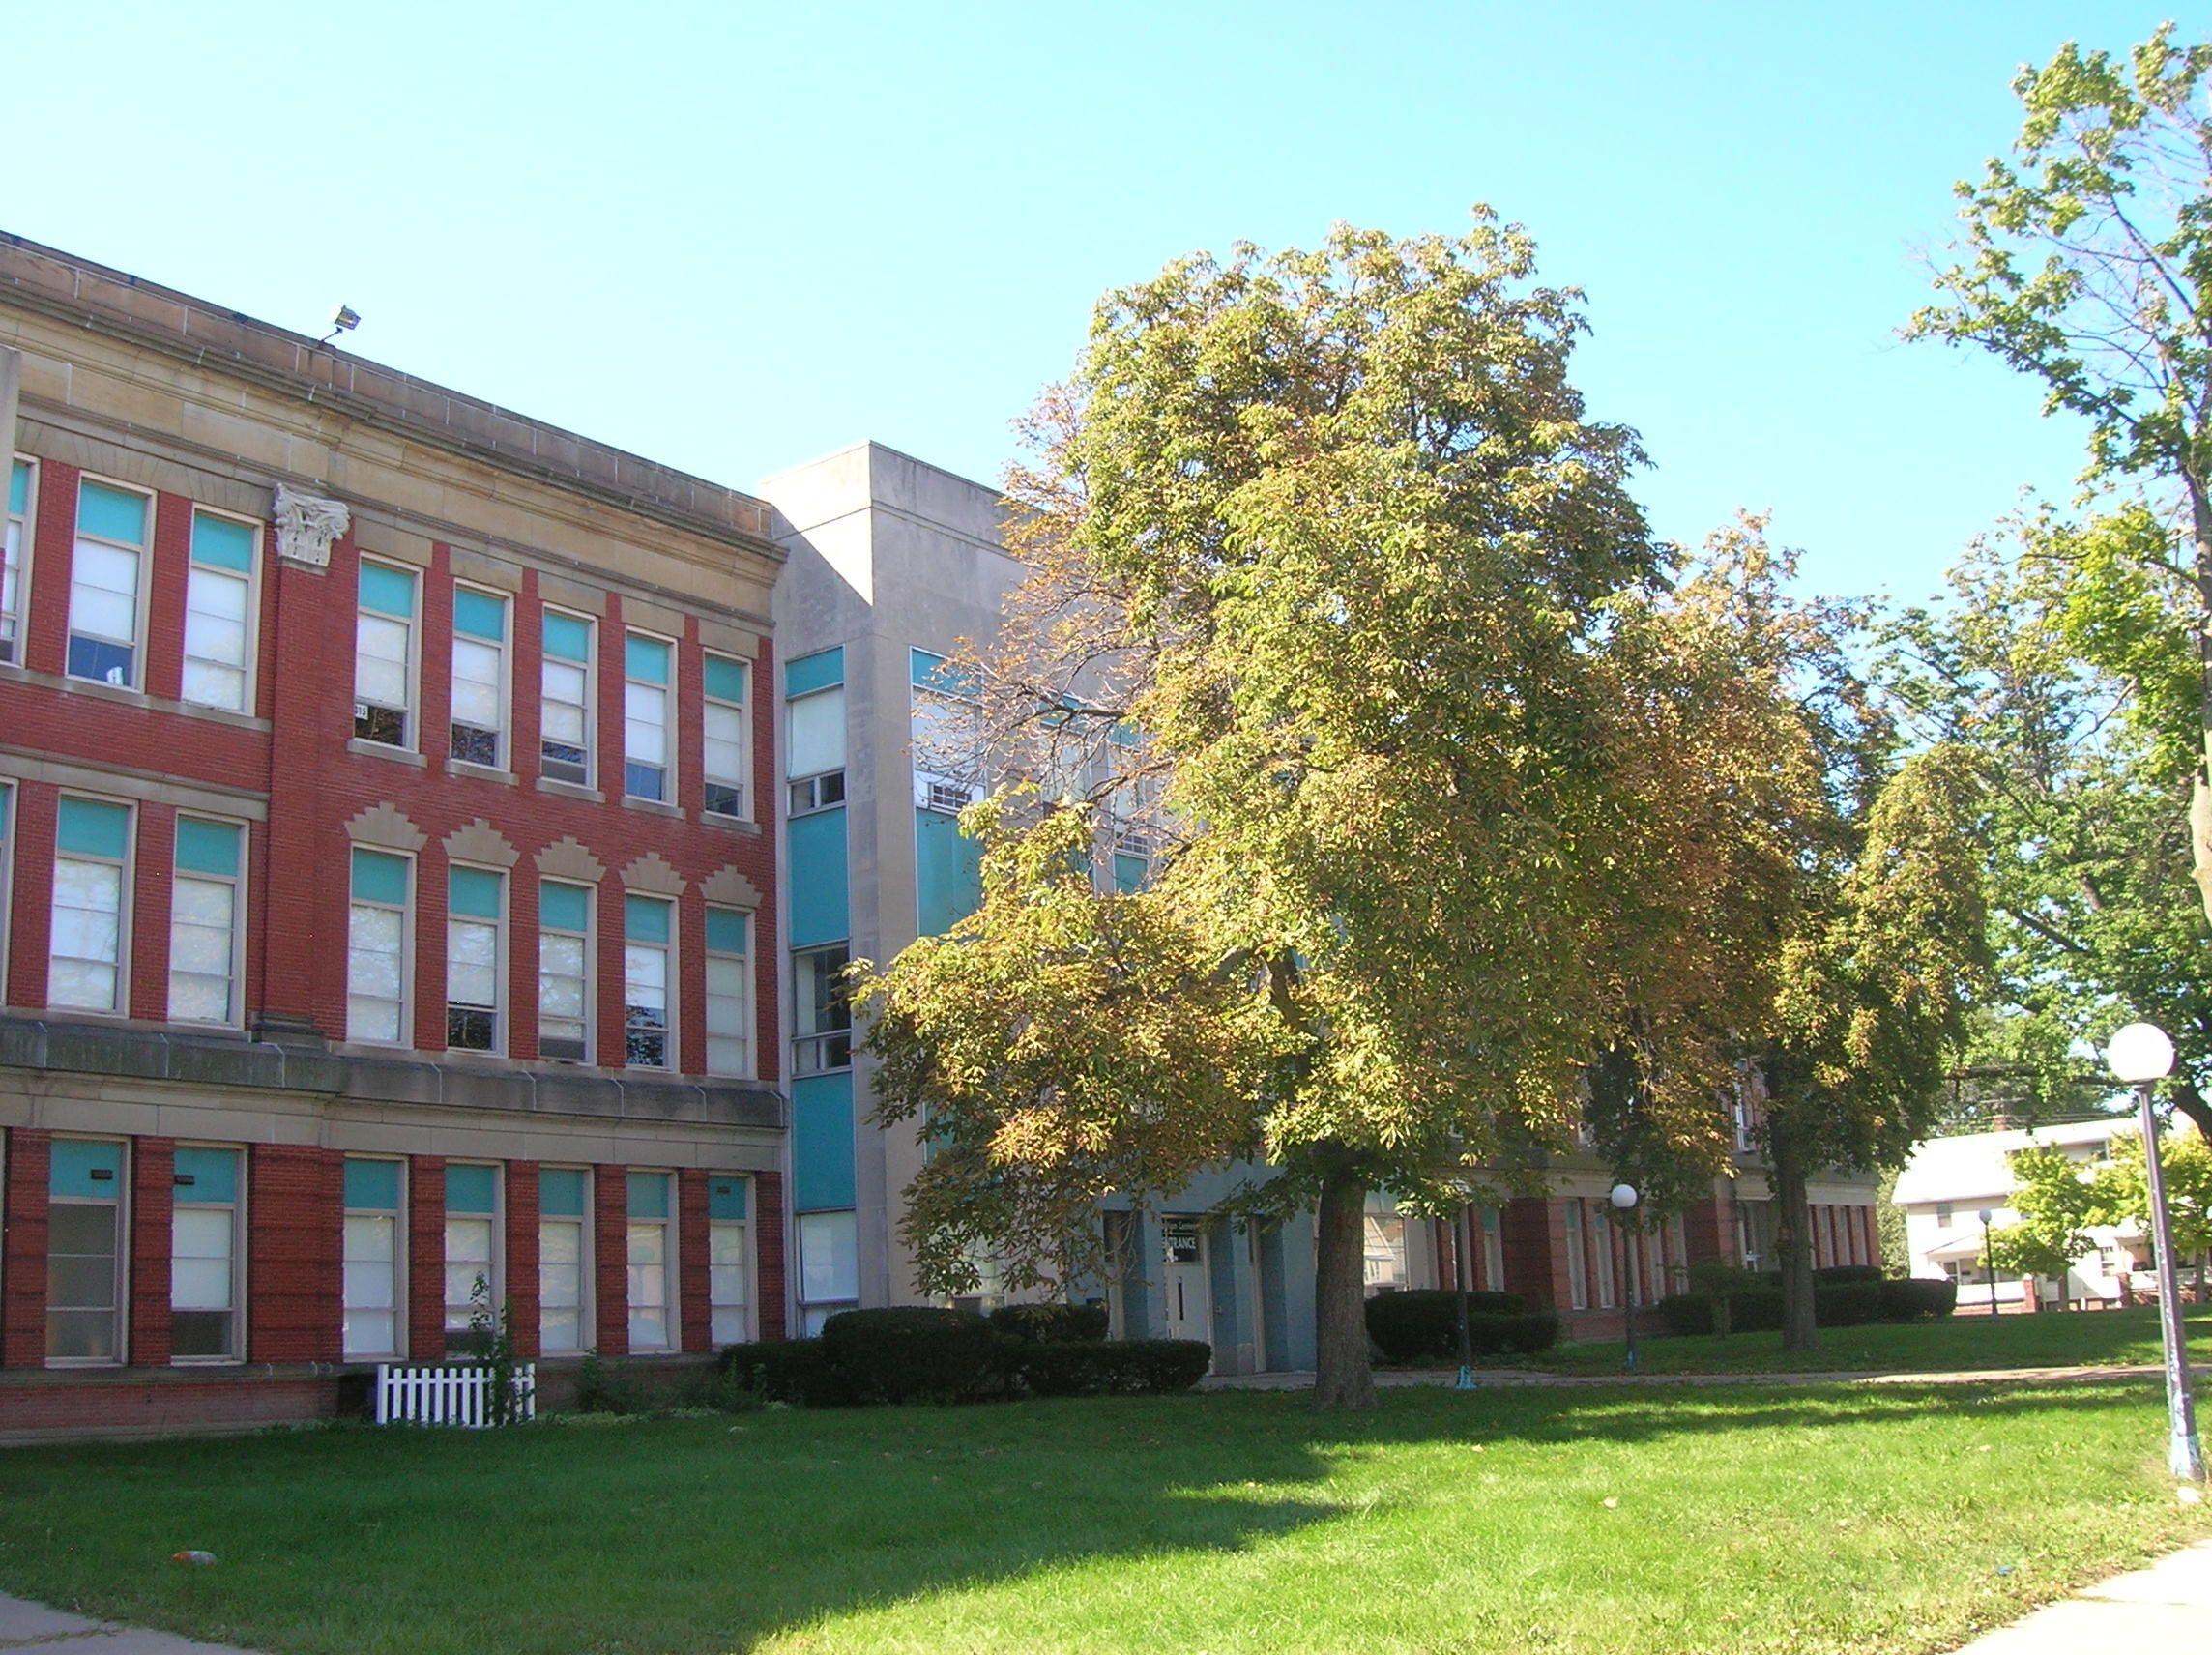 092207 Lorain High School 2 Lorain Ohio 6 Lorain Lorain Ohio Ohio